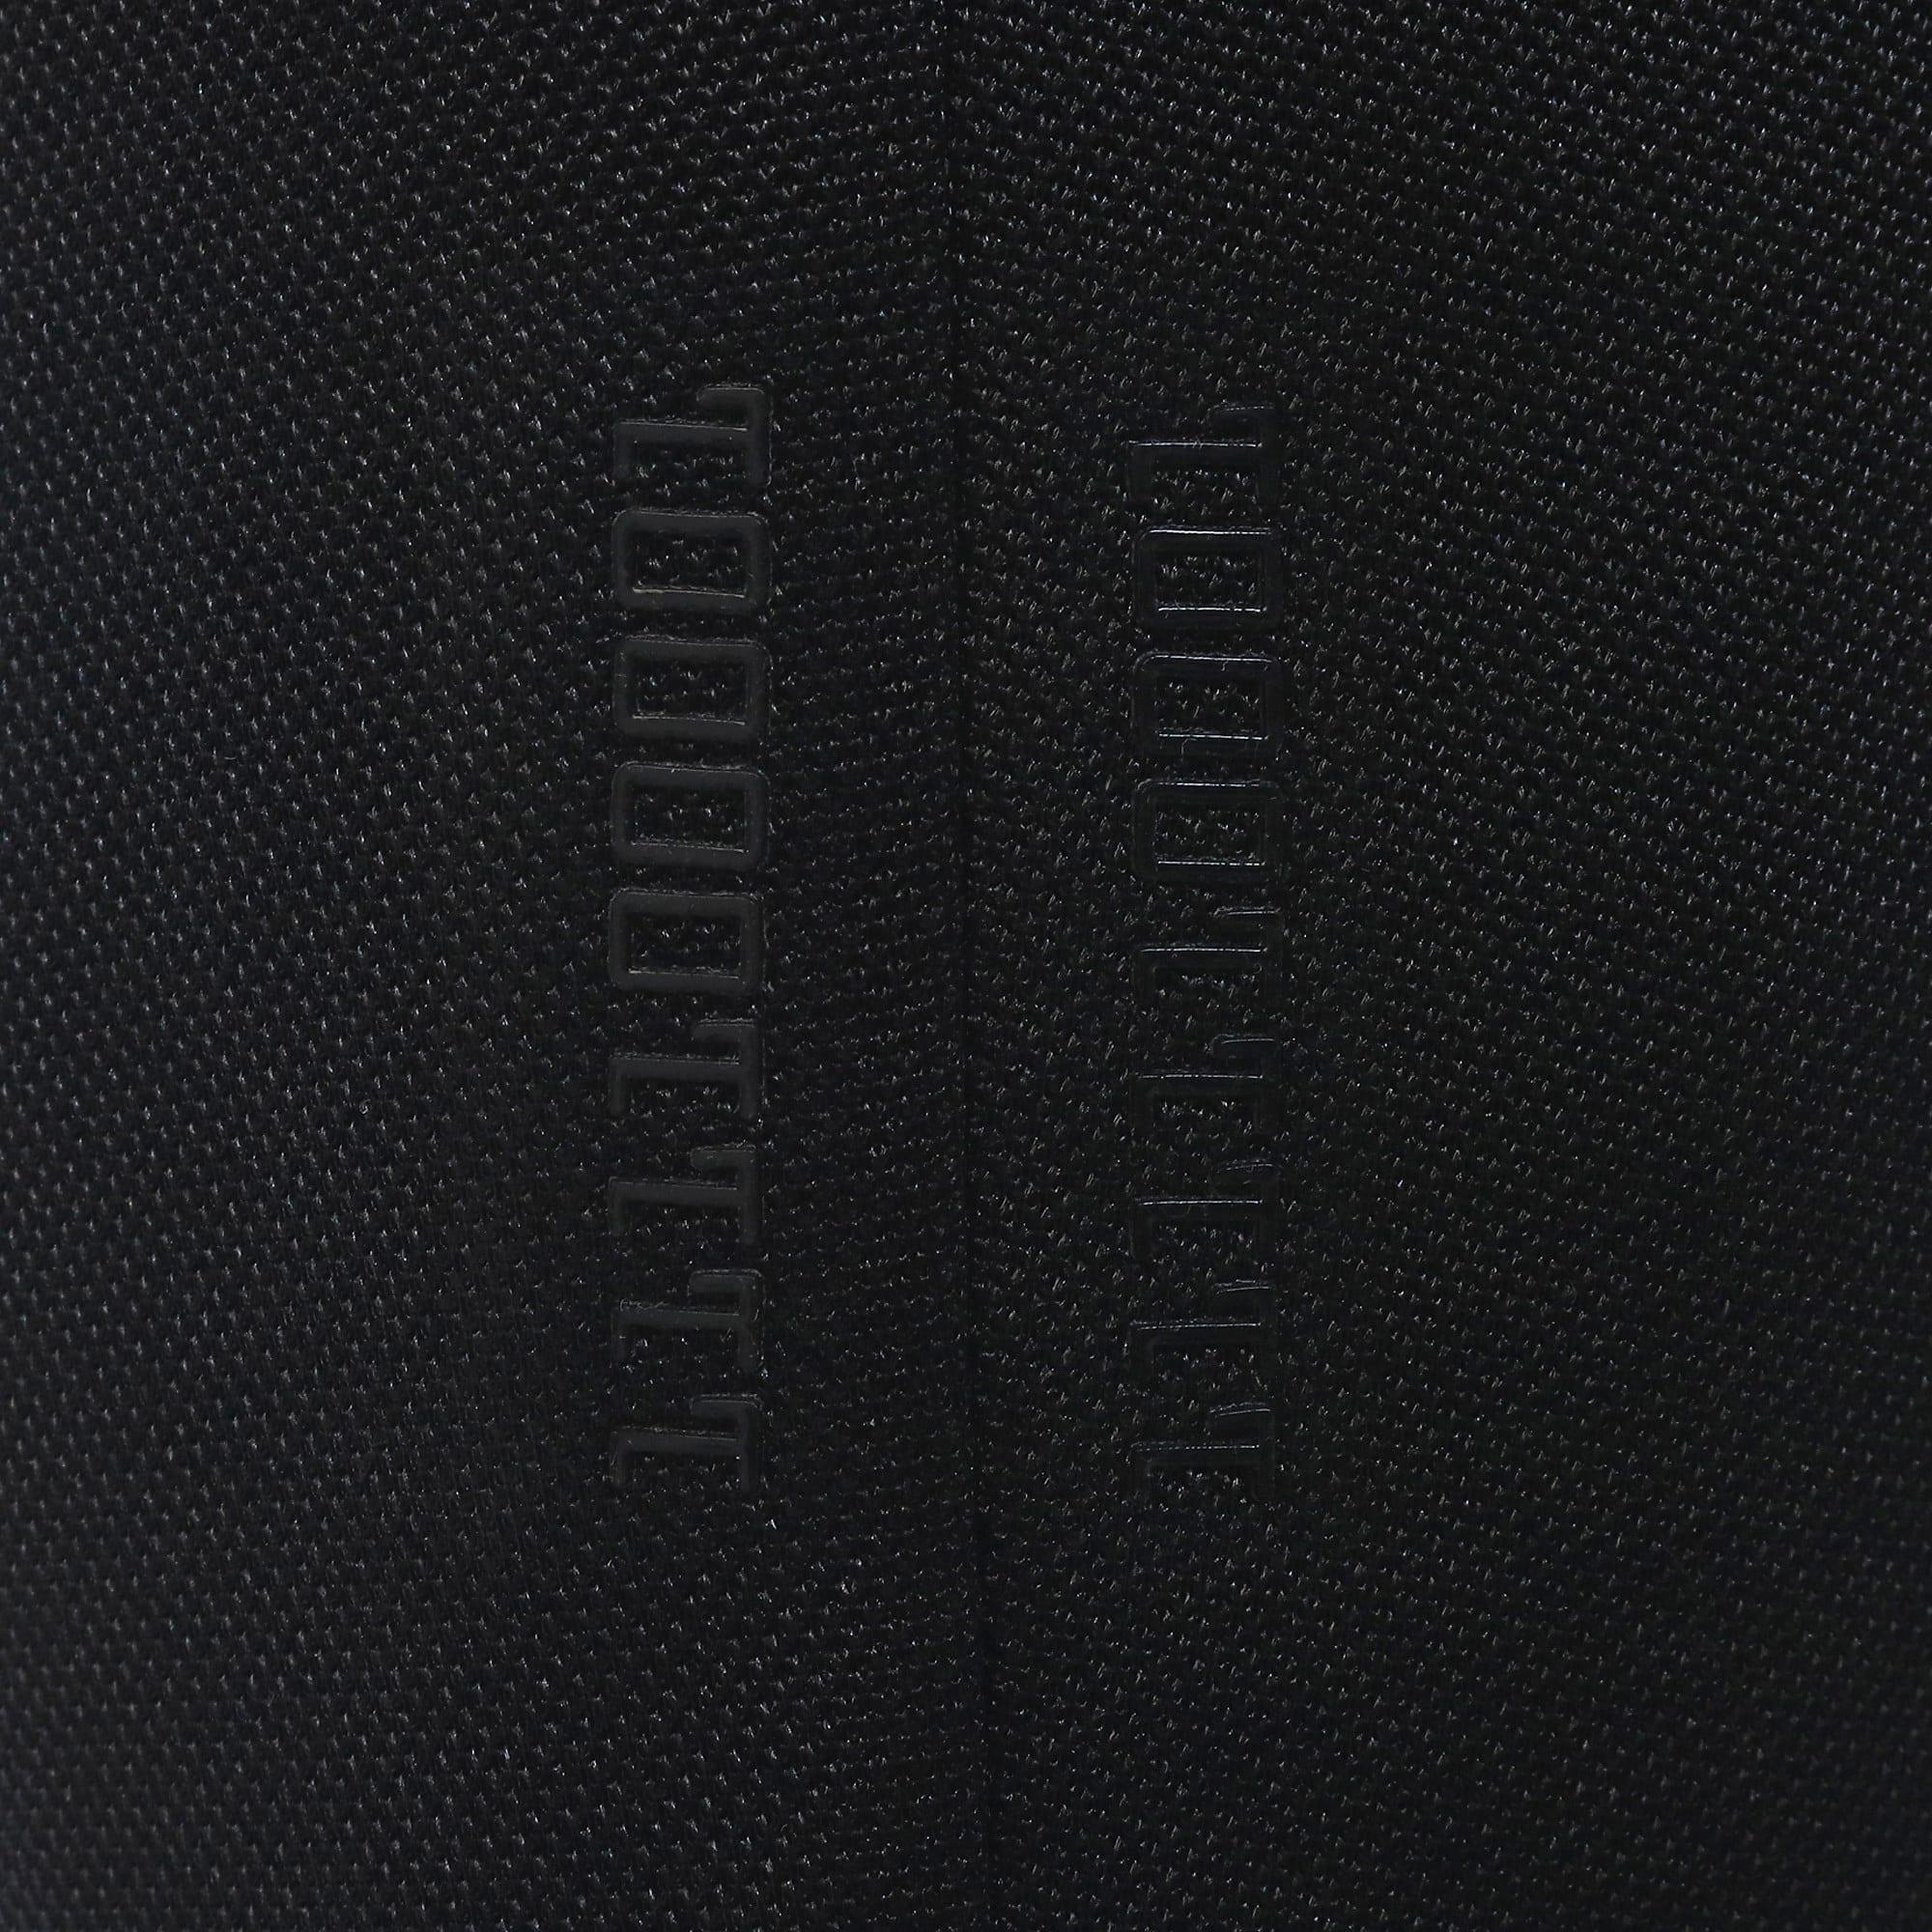 Thumbnail 7 of RS-0 CAPSULE PANTS, Puma Black, medium-JPN